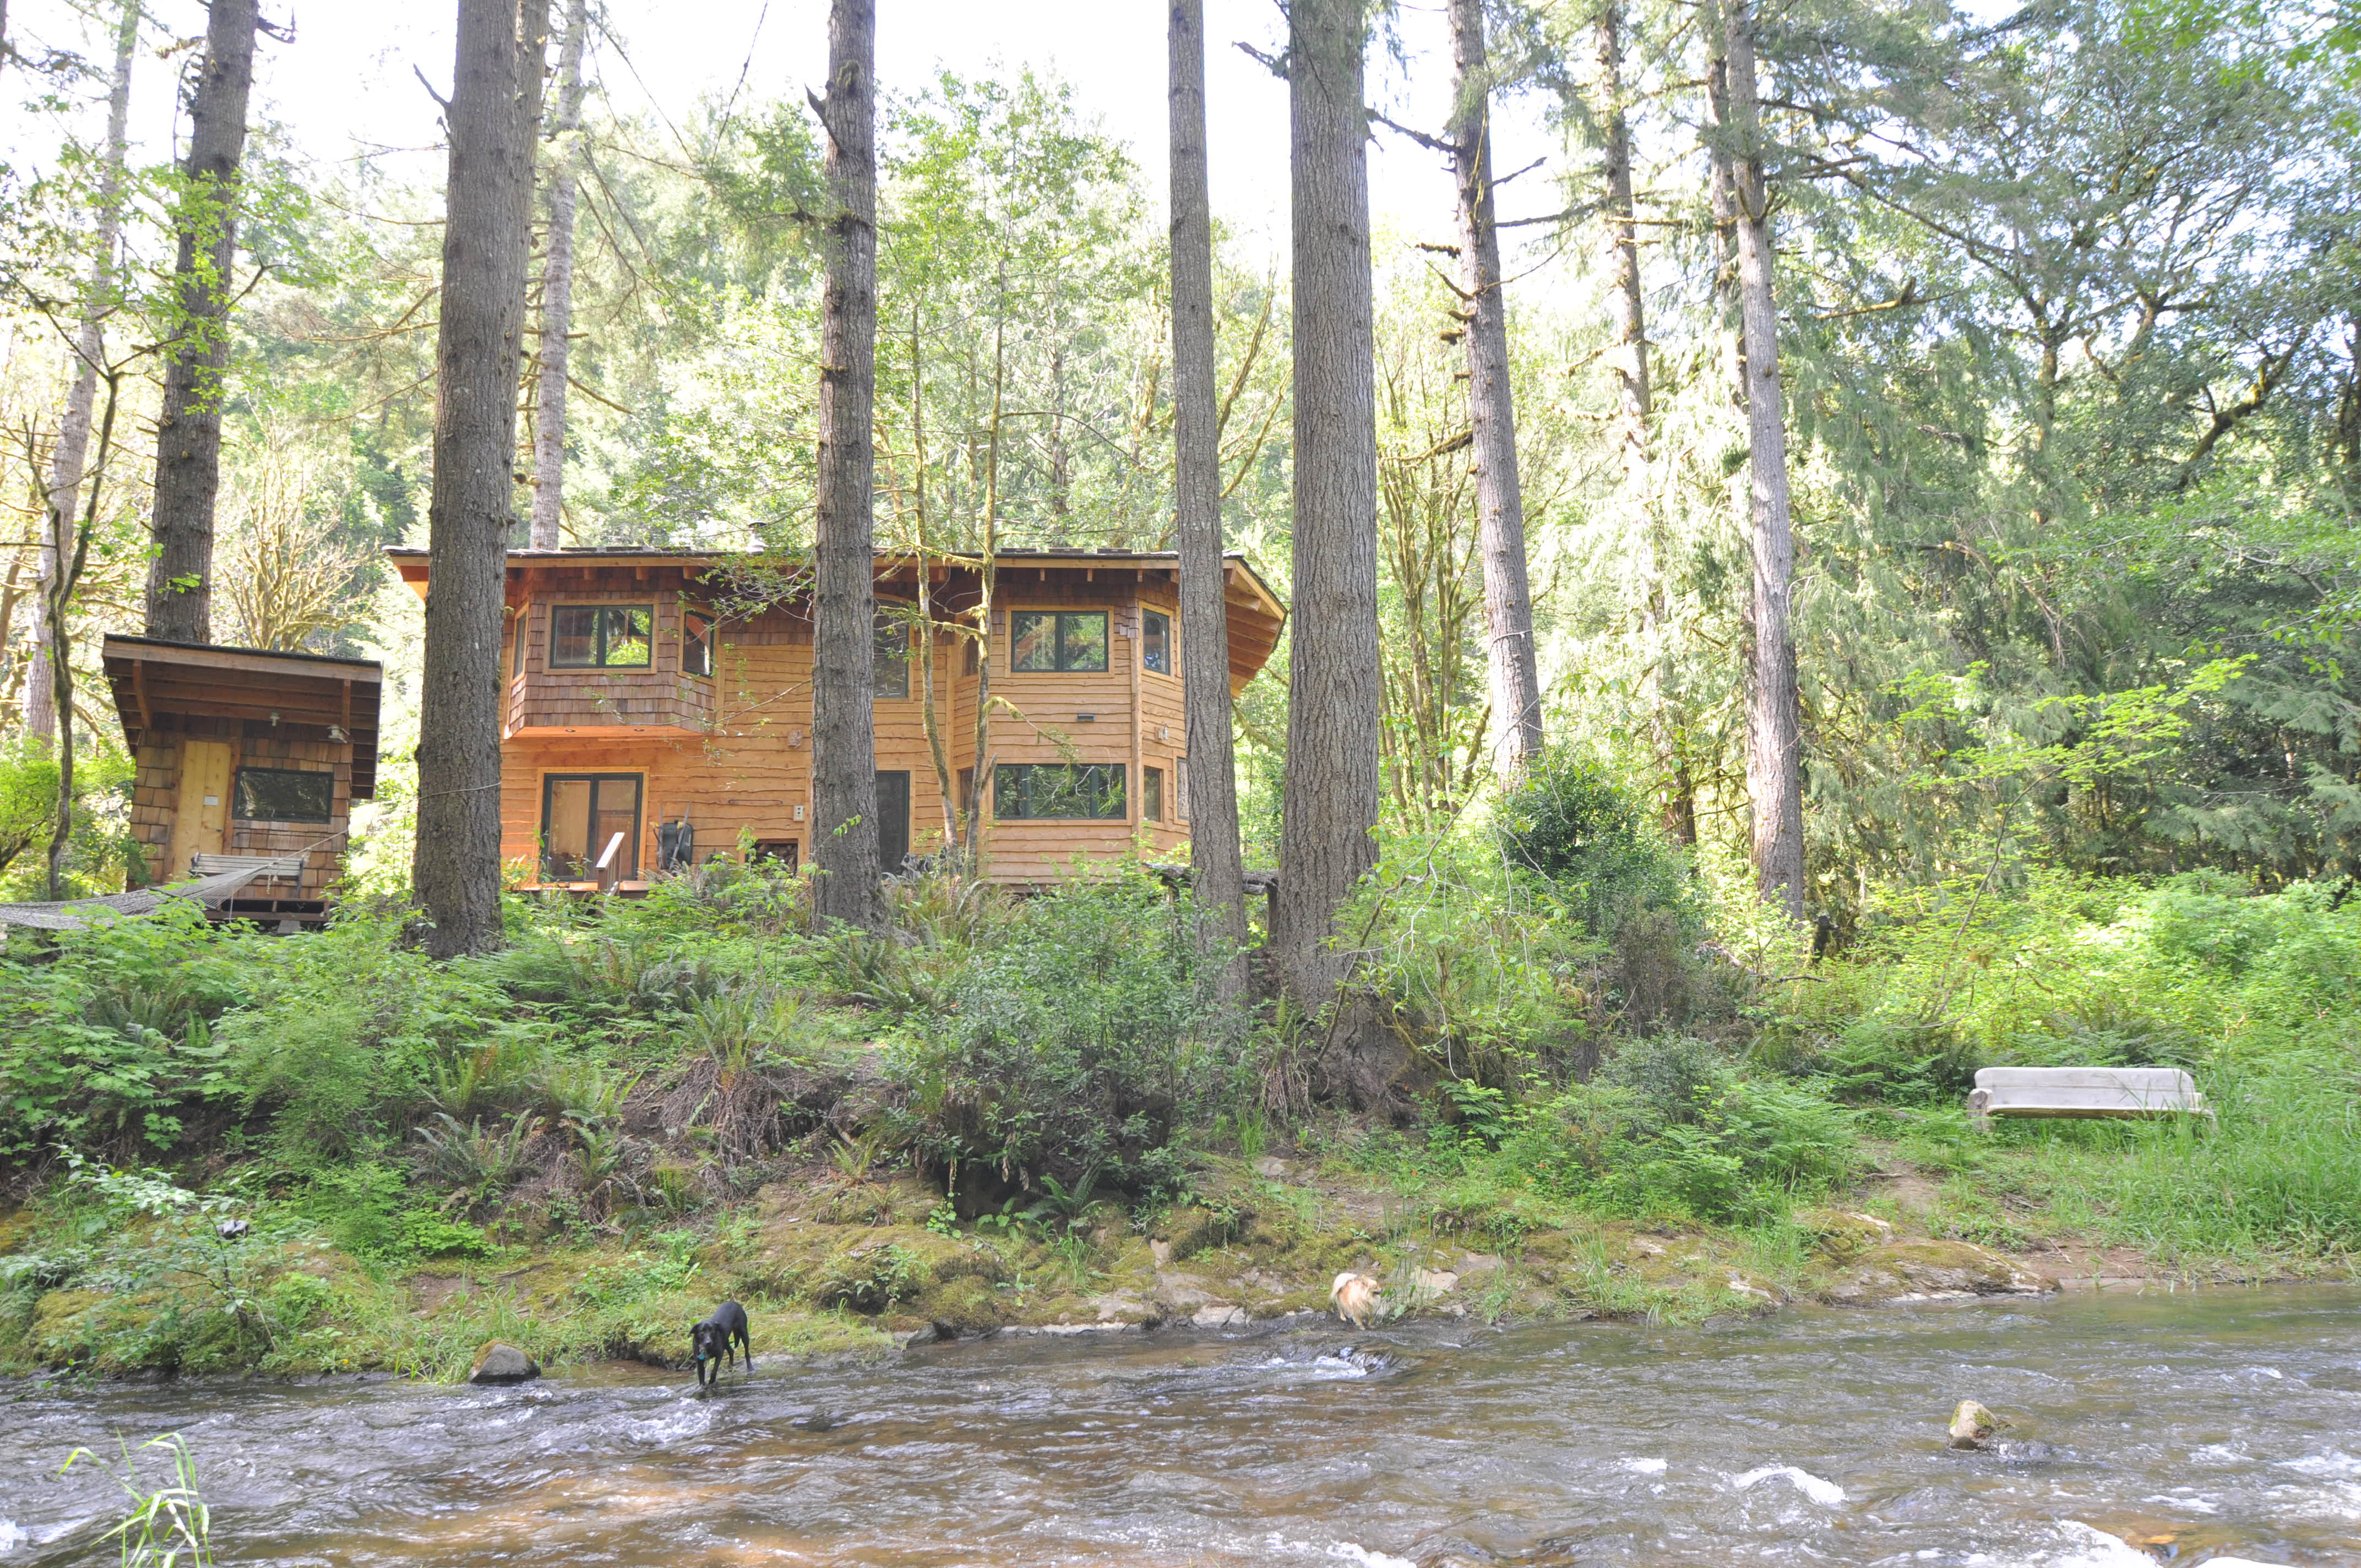 muddycreek deepcreek cabin deep weddings falls swallow themes at rentals outdoor cabins partner venue lodging creek wedding fall venues